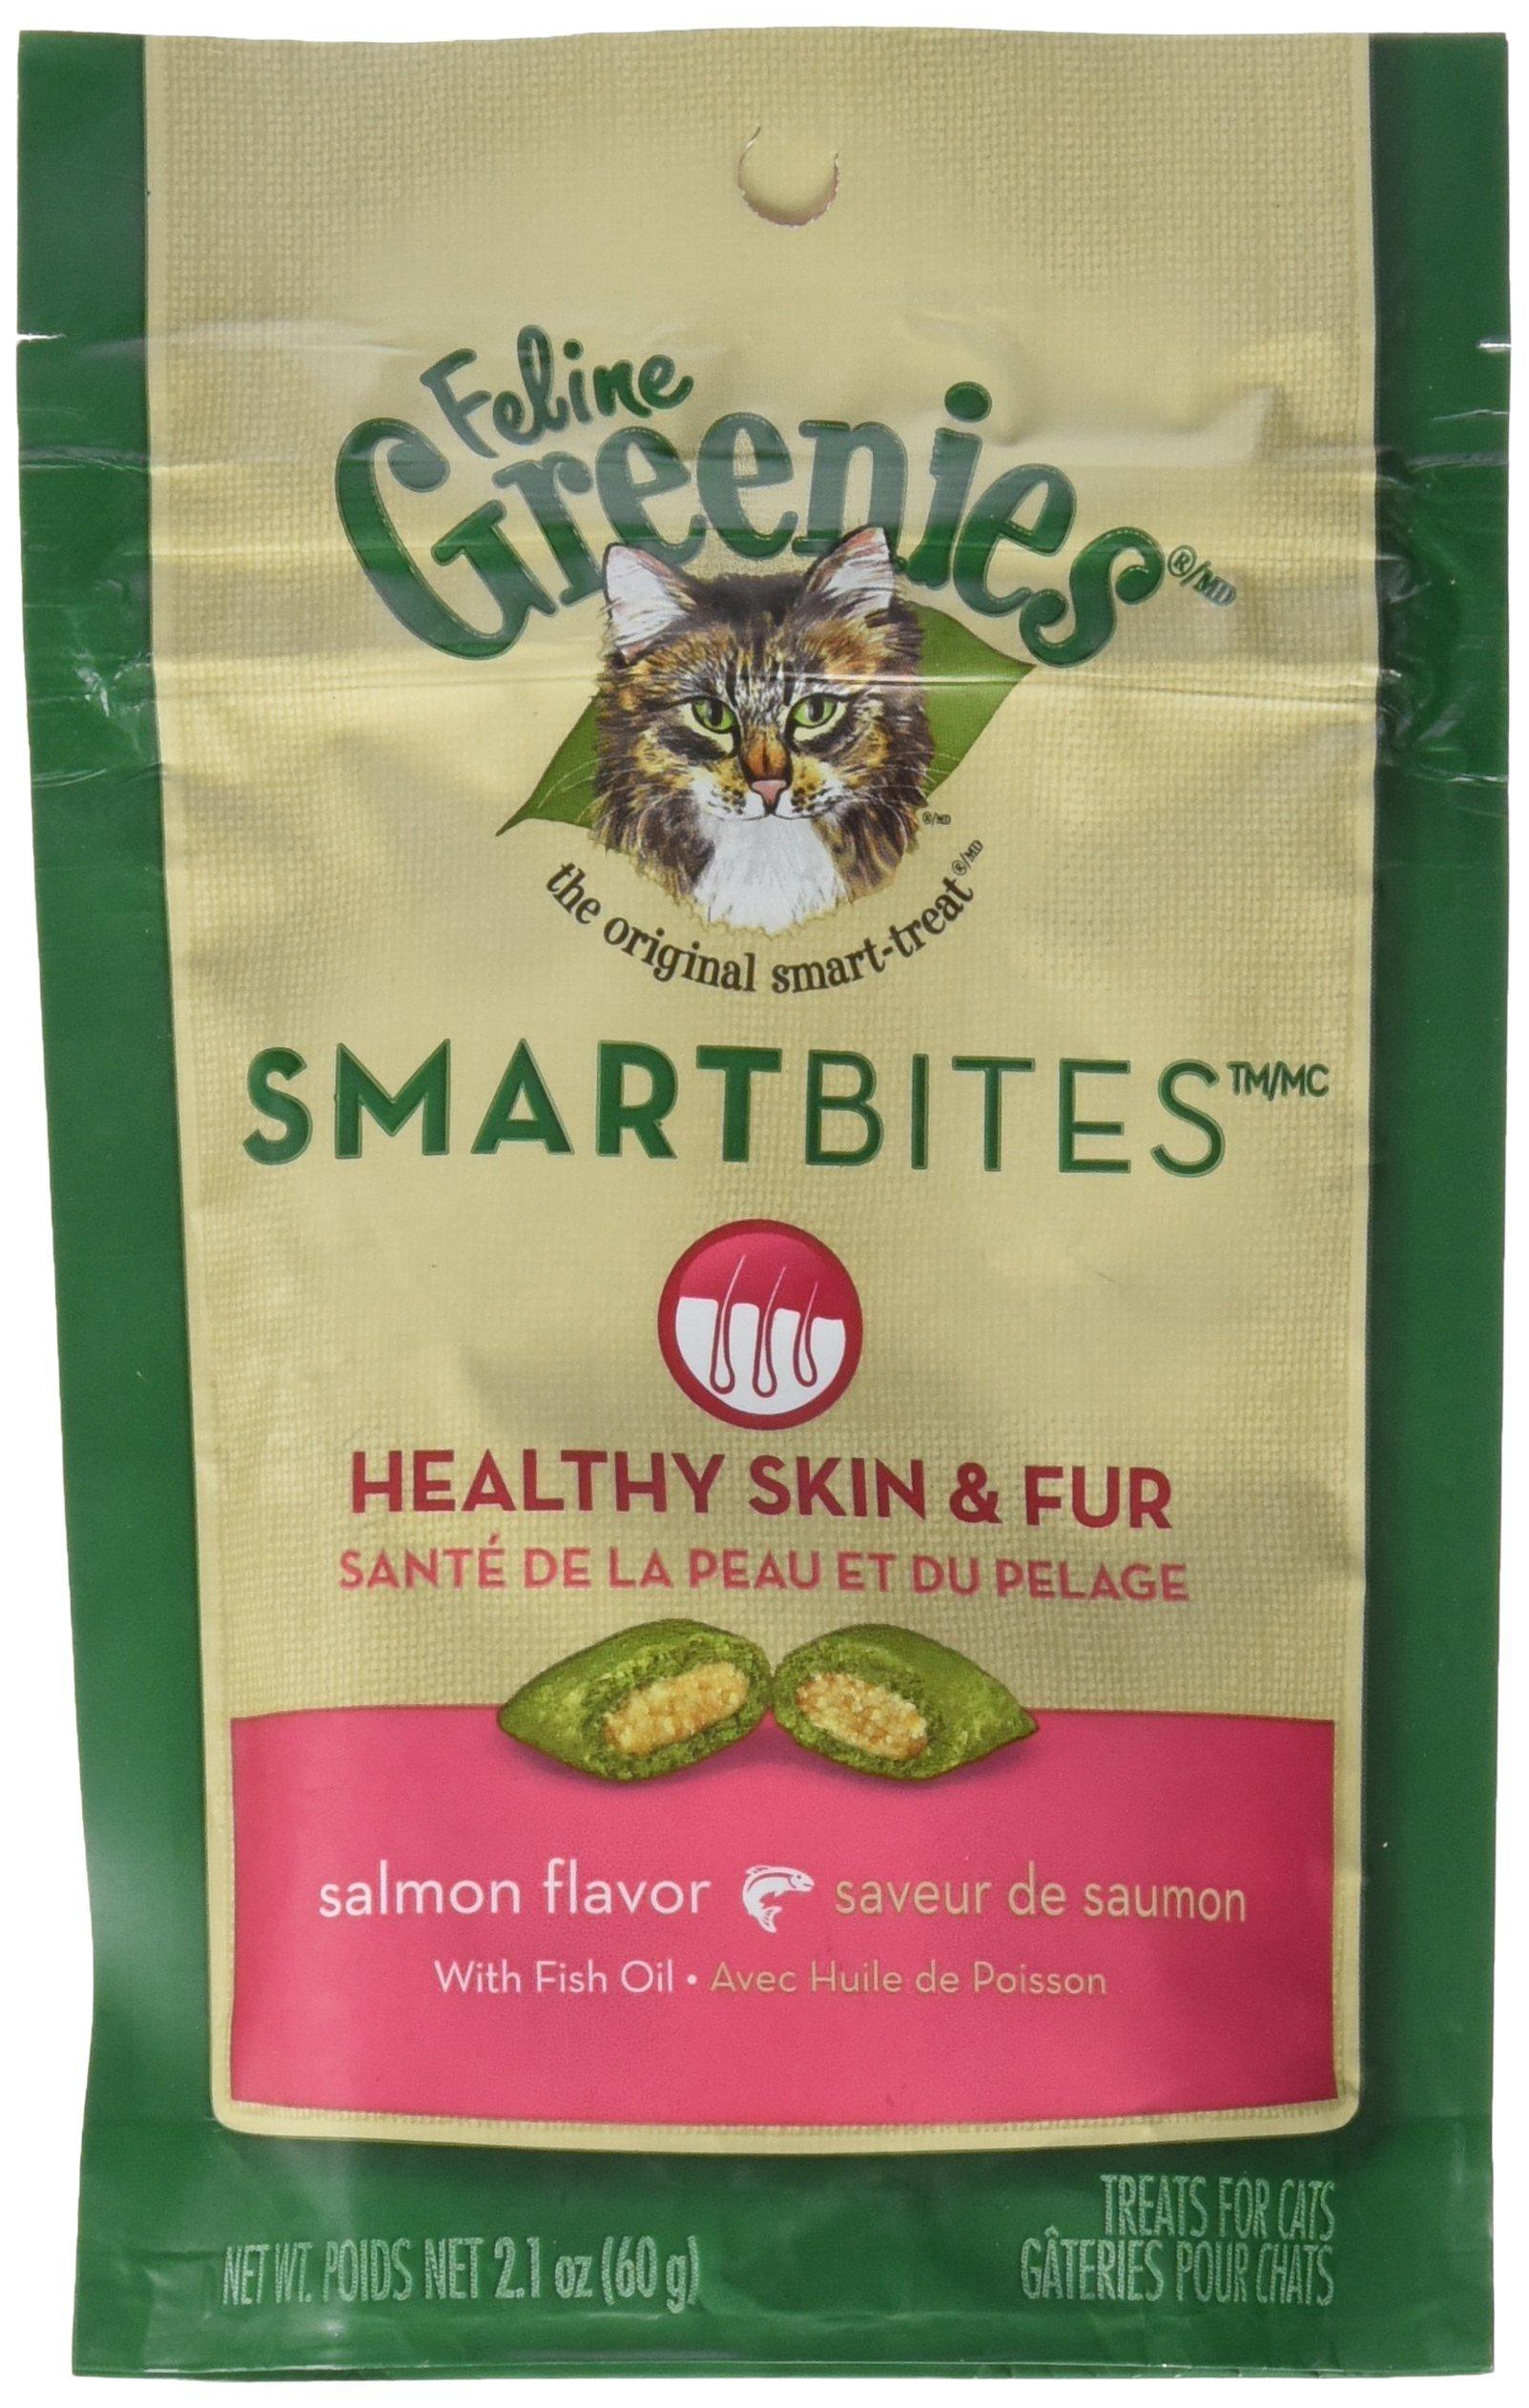 Greenies Feline SMARTBITES Skin & Fur Salmon 2.1oz - Six (6) Packages